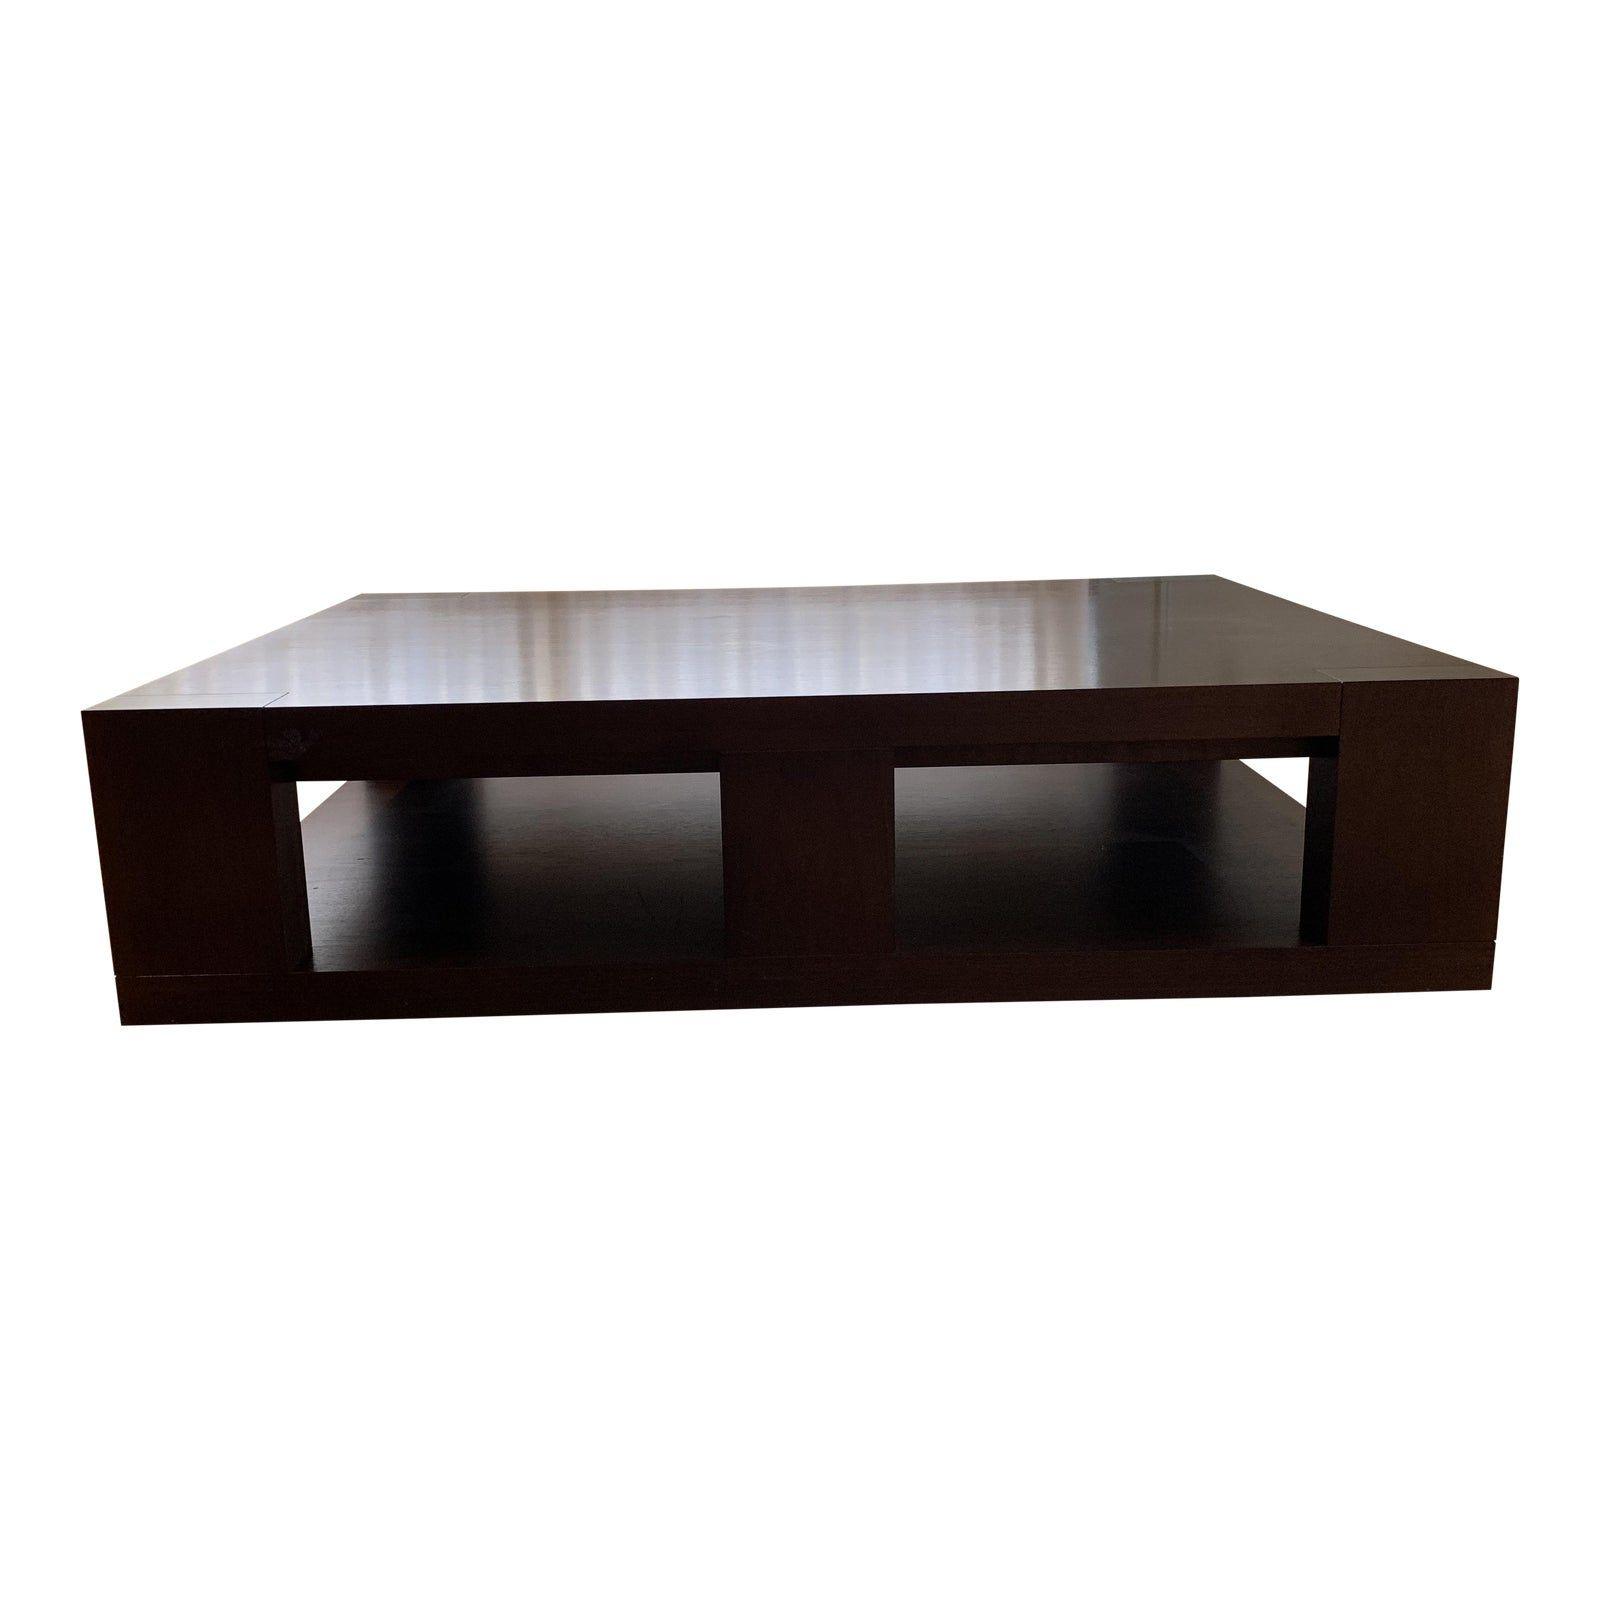 Christian Liaigre Contemporary Walnut Coffee Table Chairish Coffee Table Walnut Coffee Table Table [ 1600 x 1600 Pixel ]